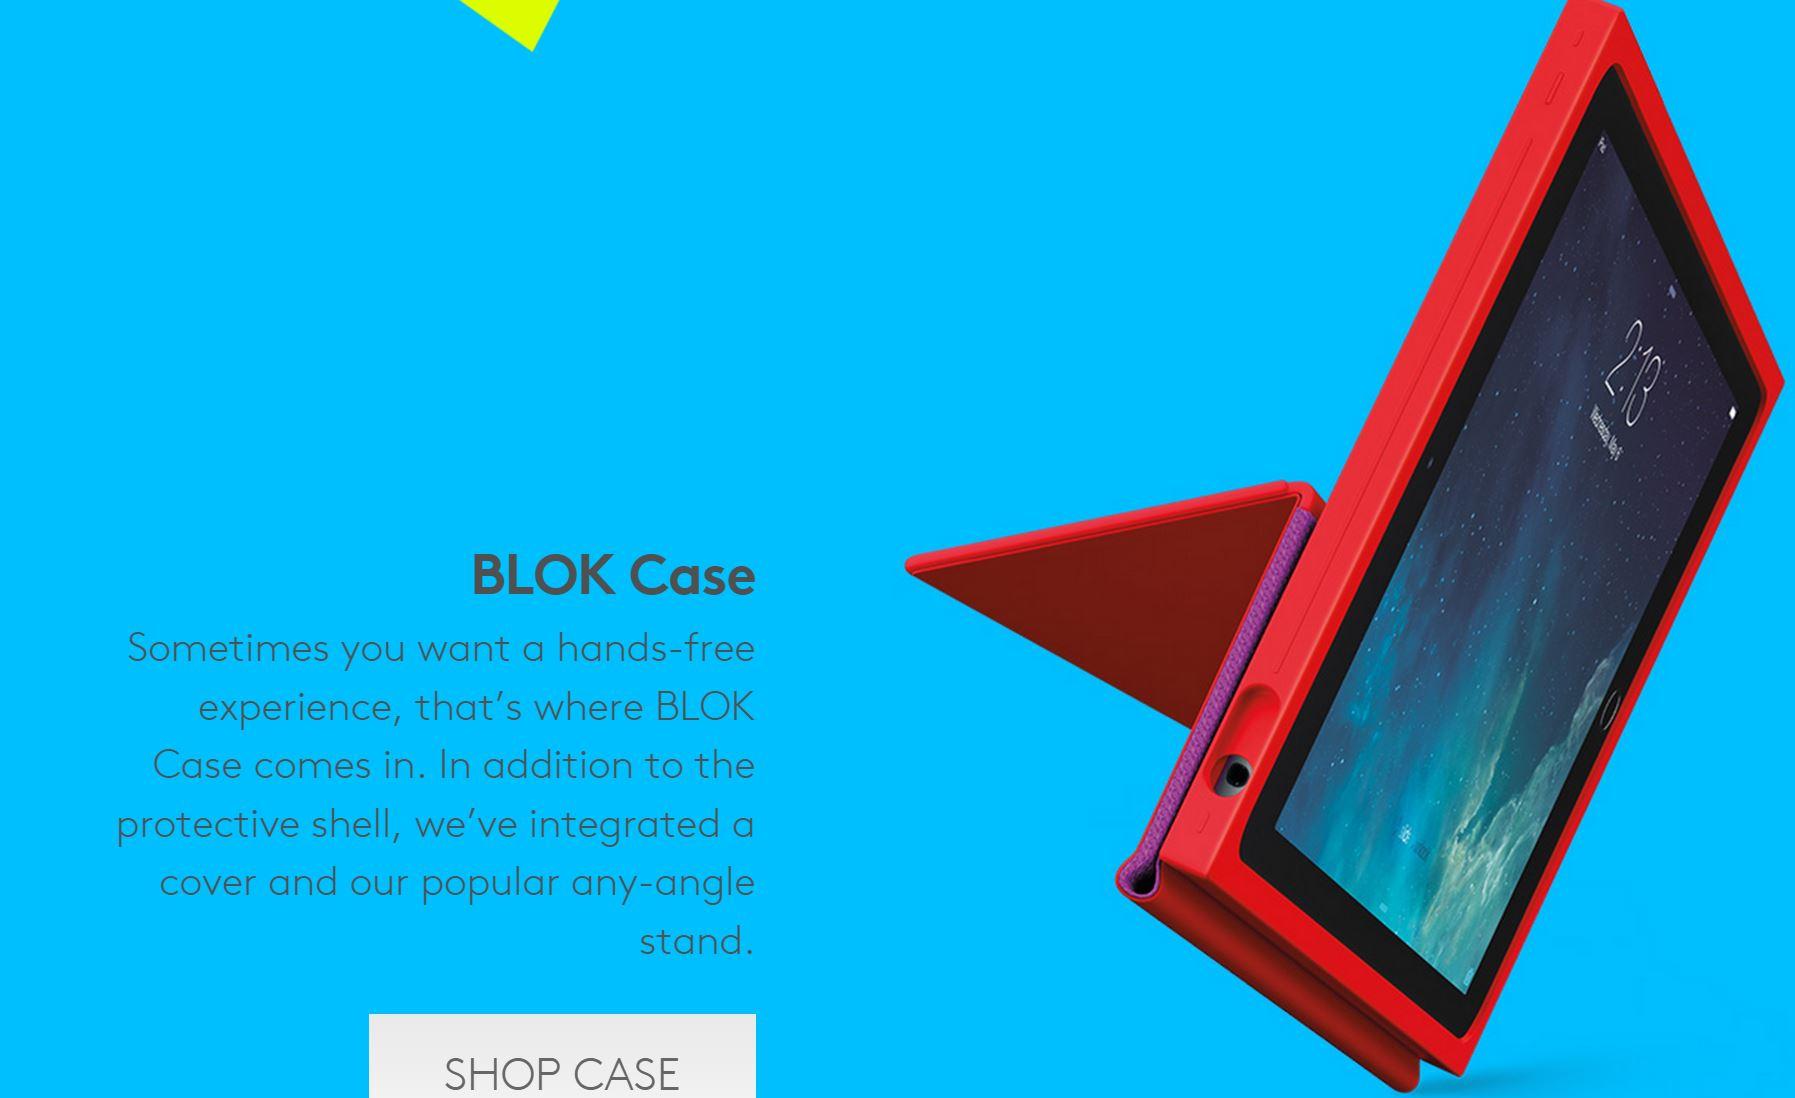 blok-case